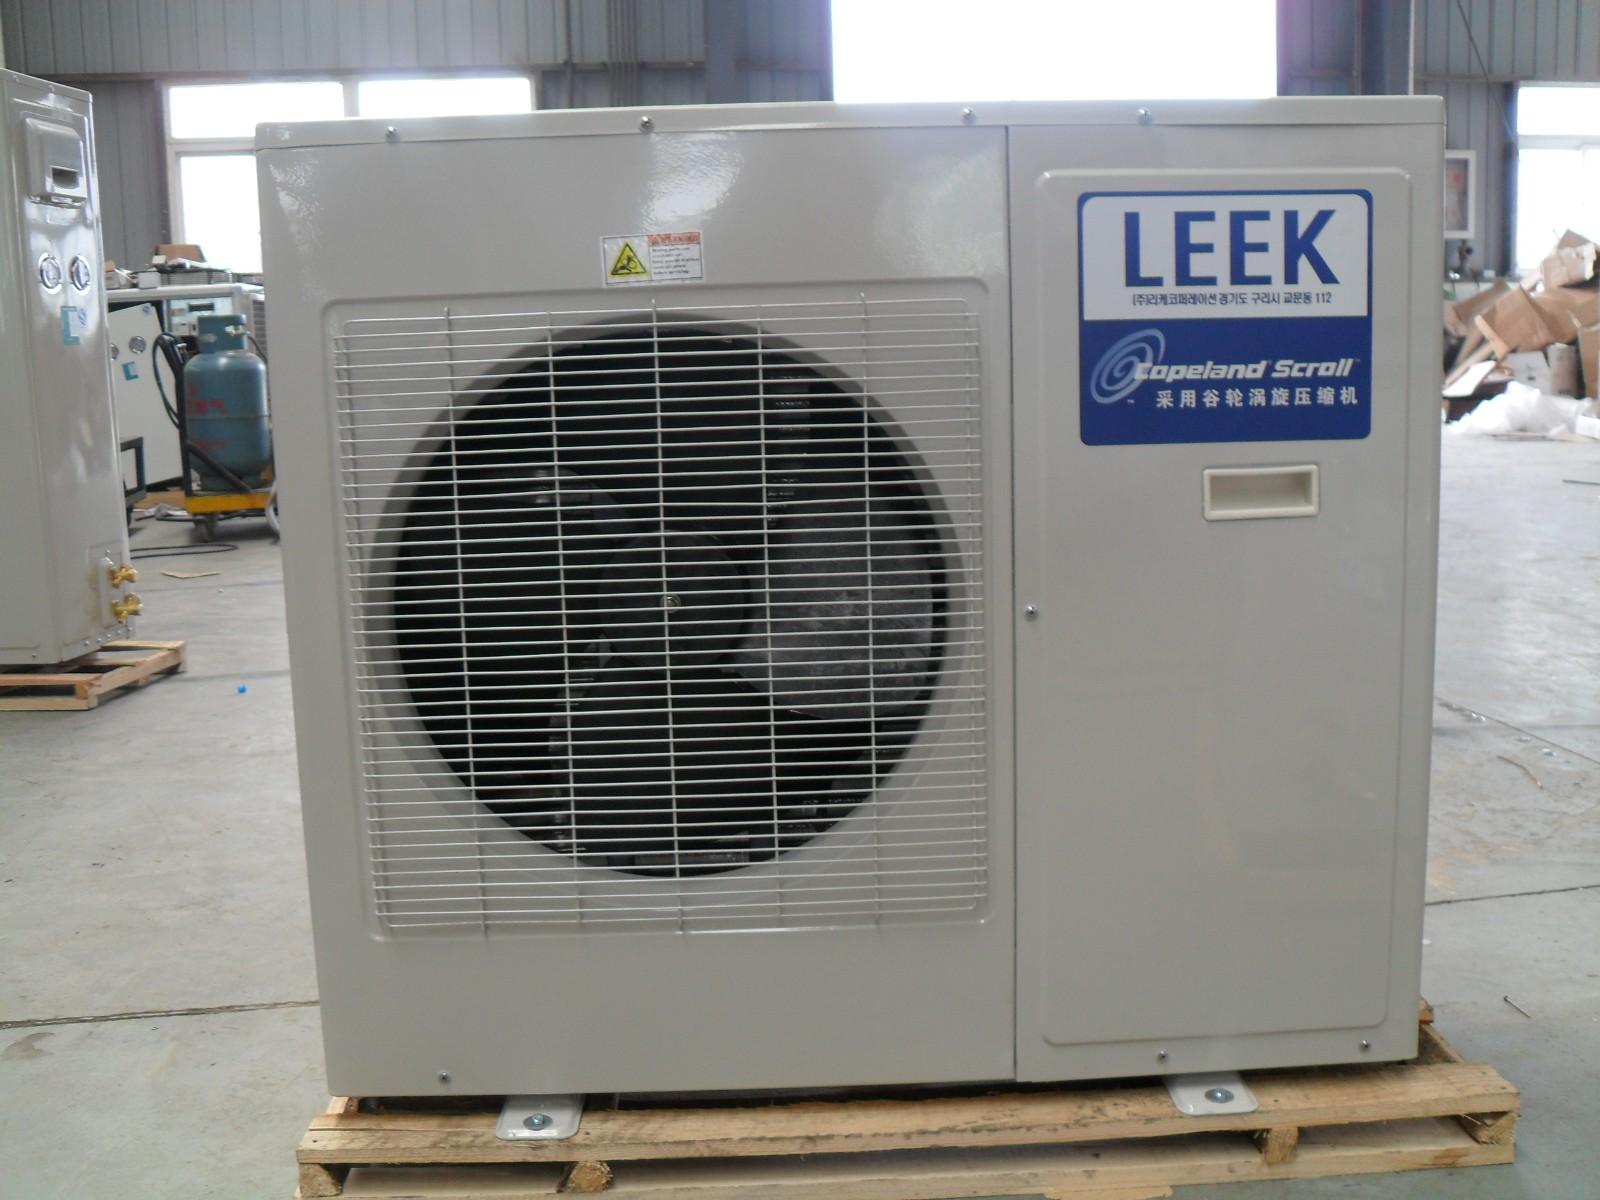 LEEK 壁挂式制冷机组 5P  LKPZ500S